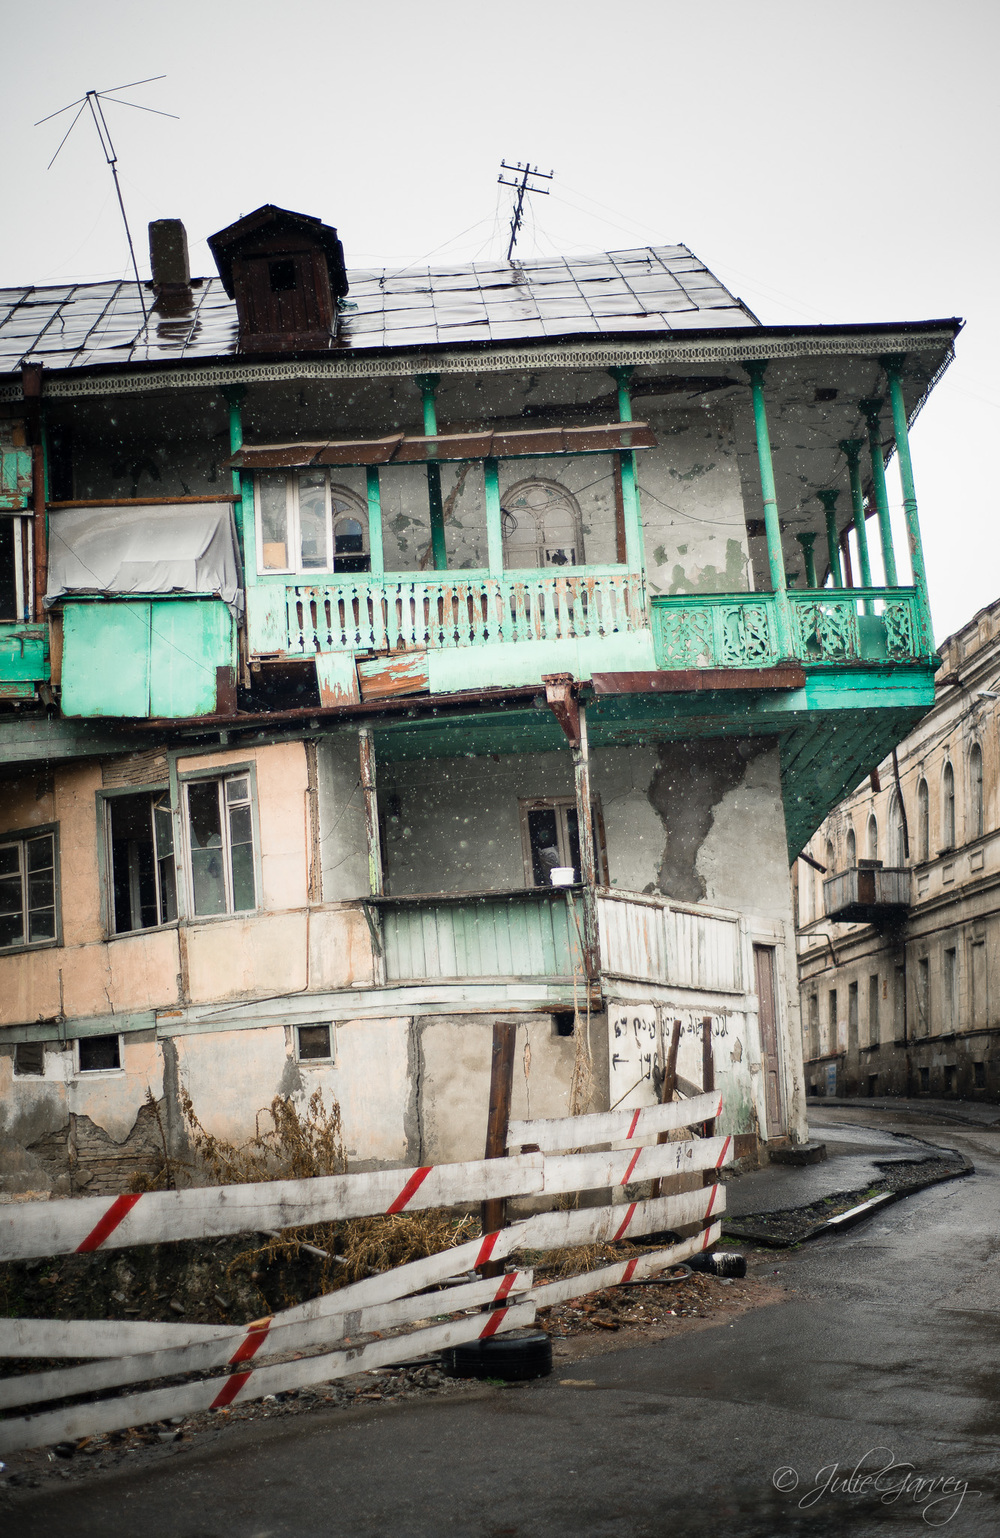 URBAN-Tbilisi-Online-2848.jpg